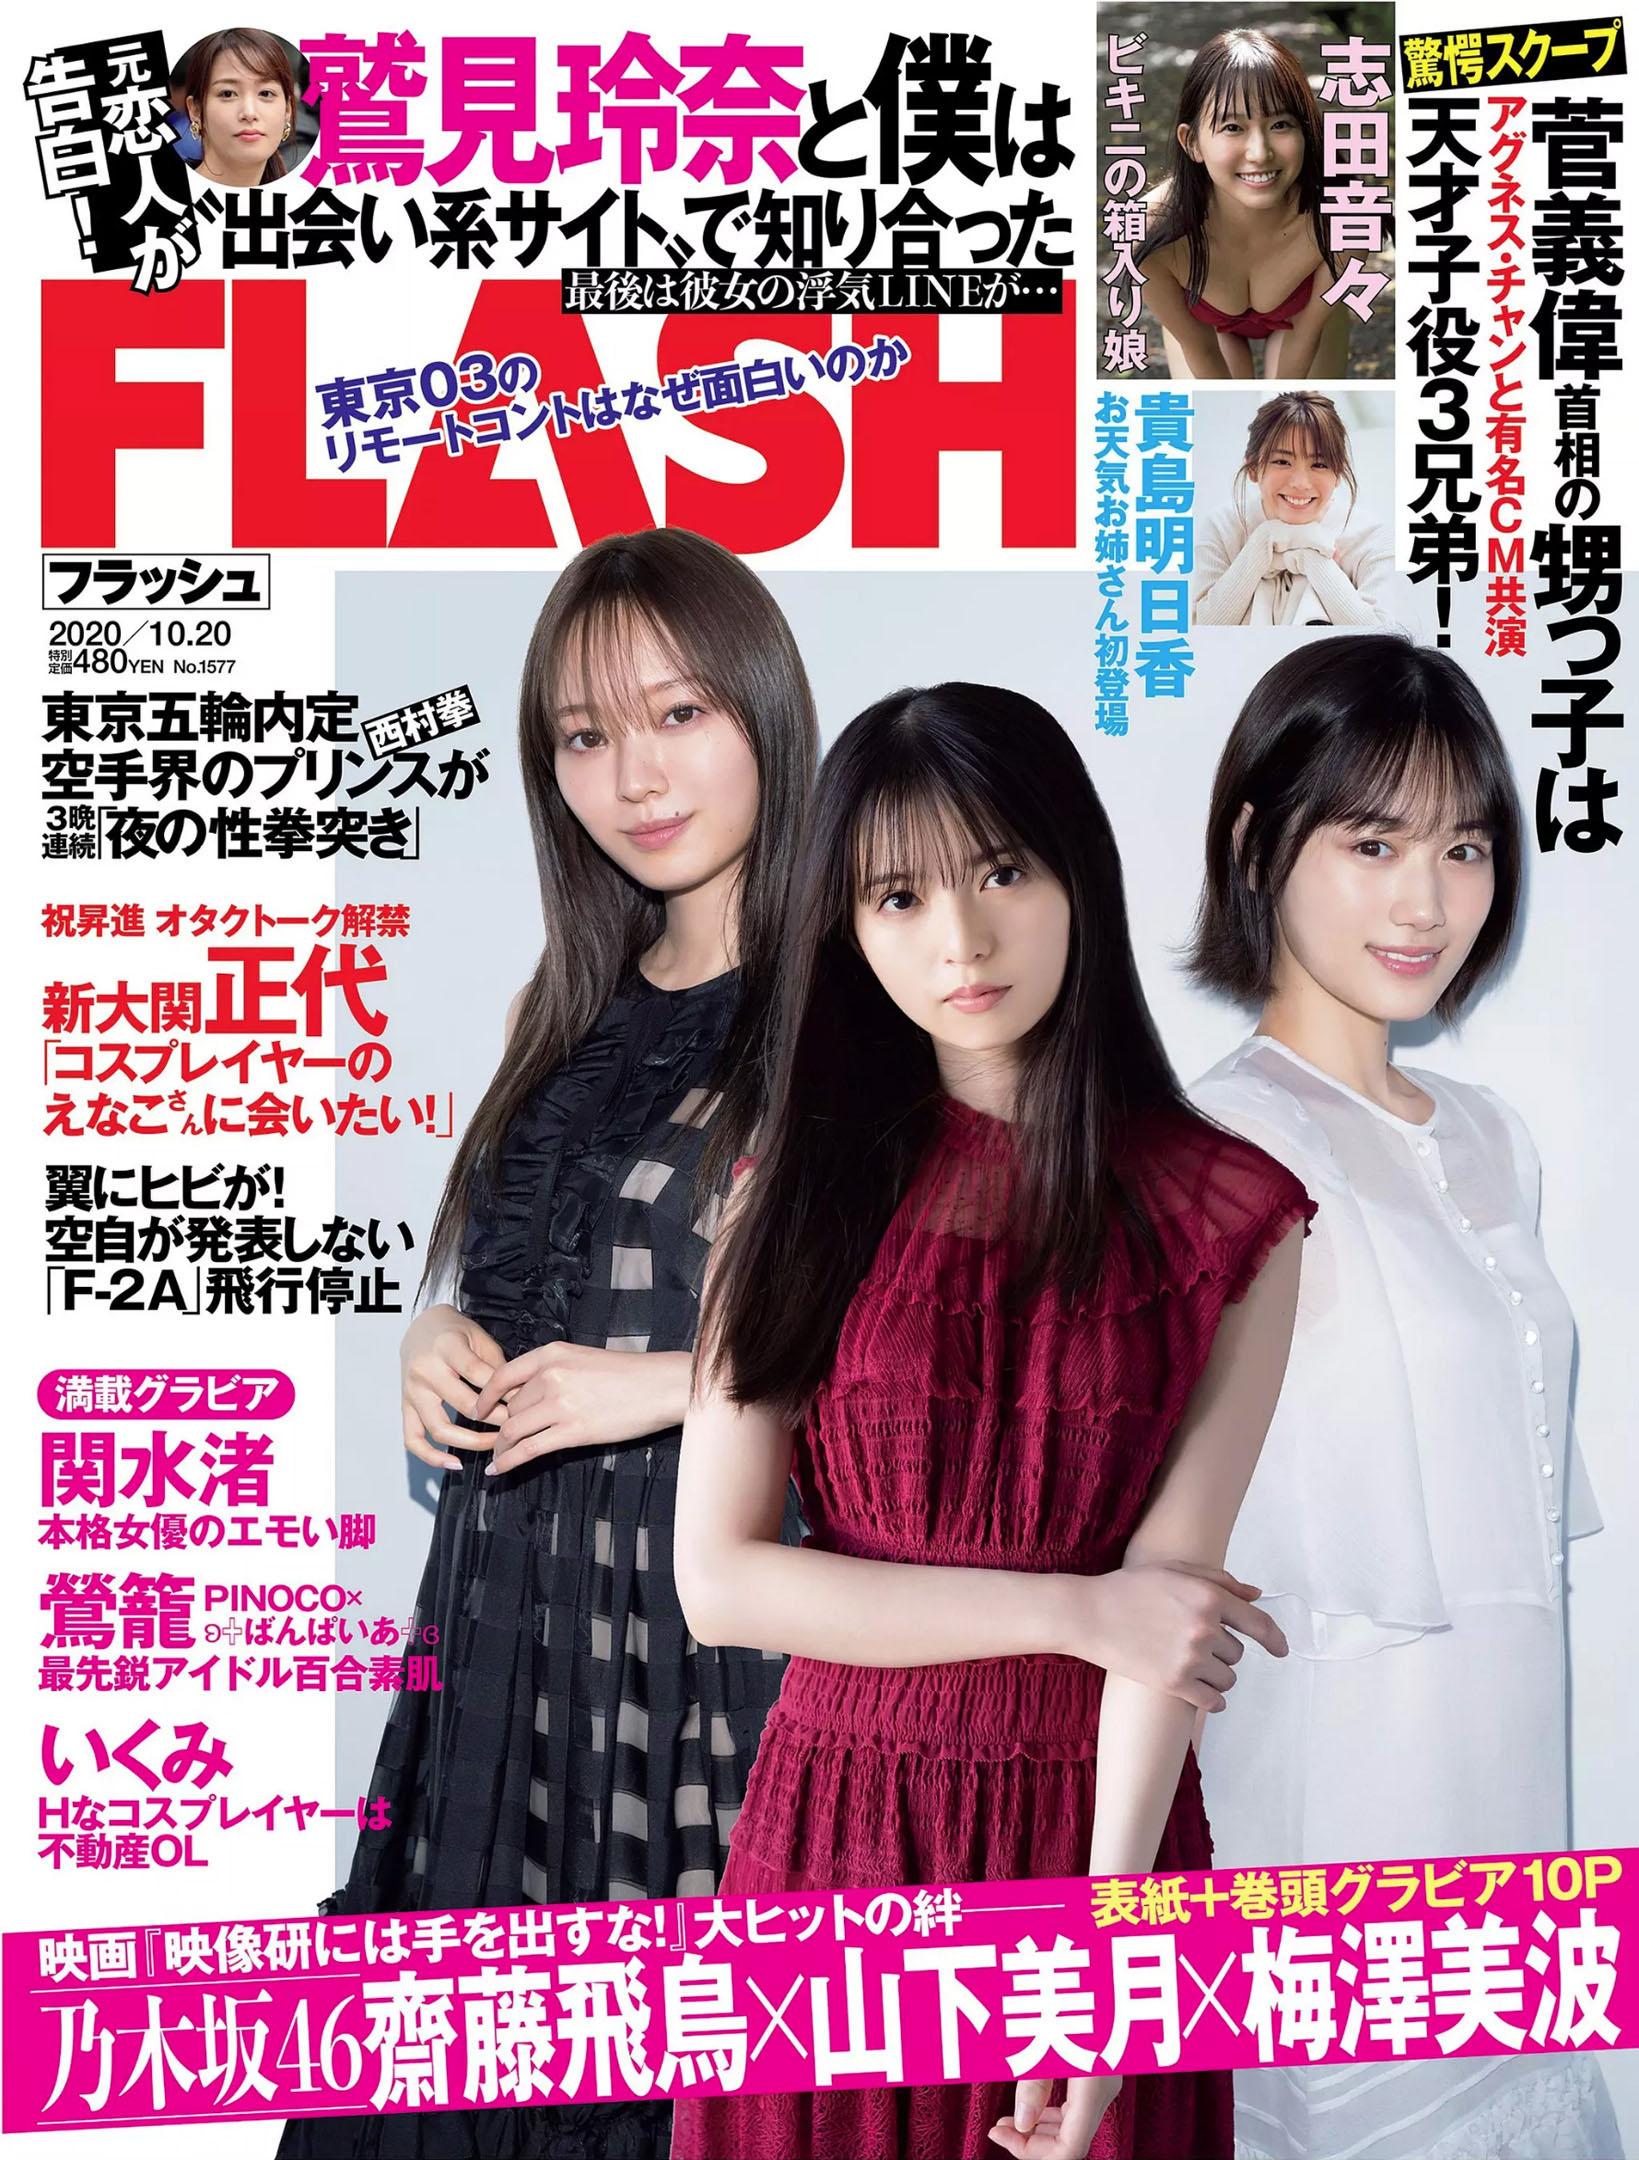 N46 Flash 201020 01.jpg